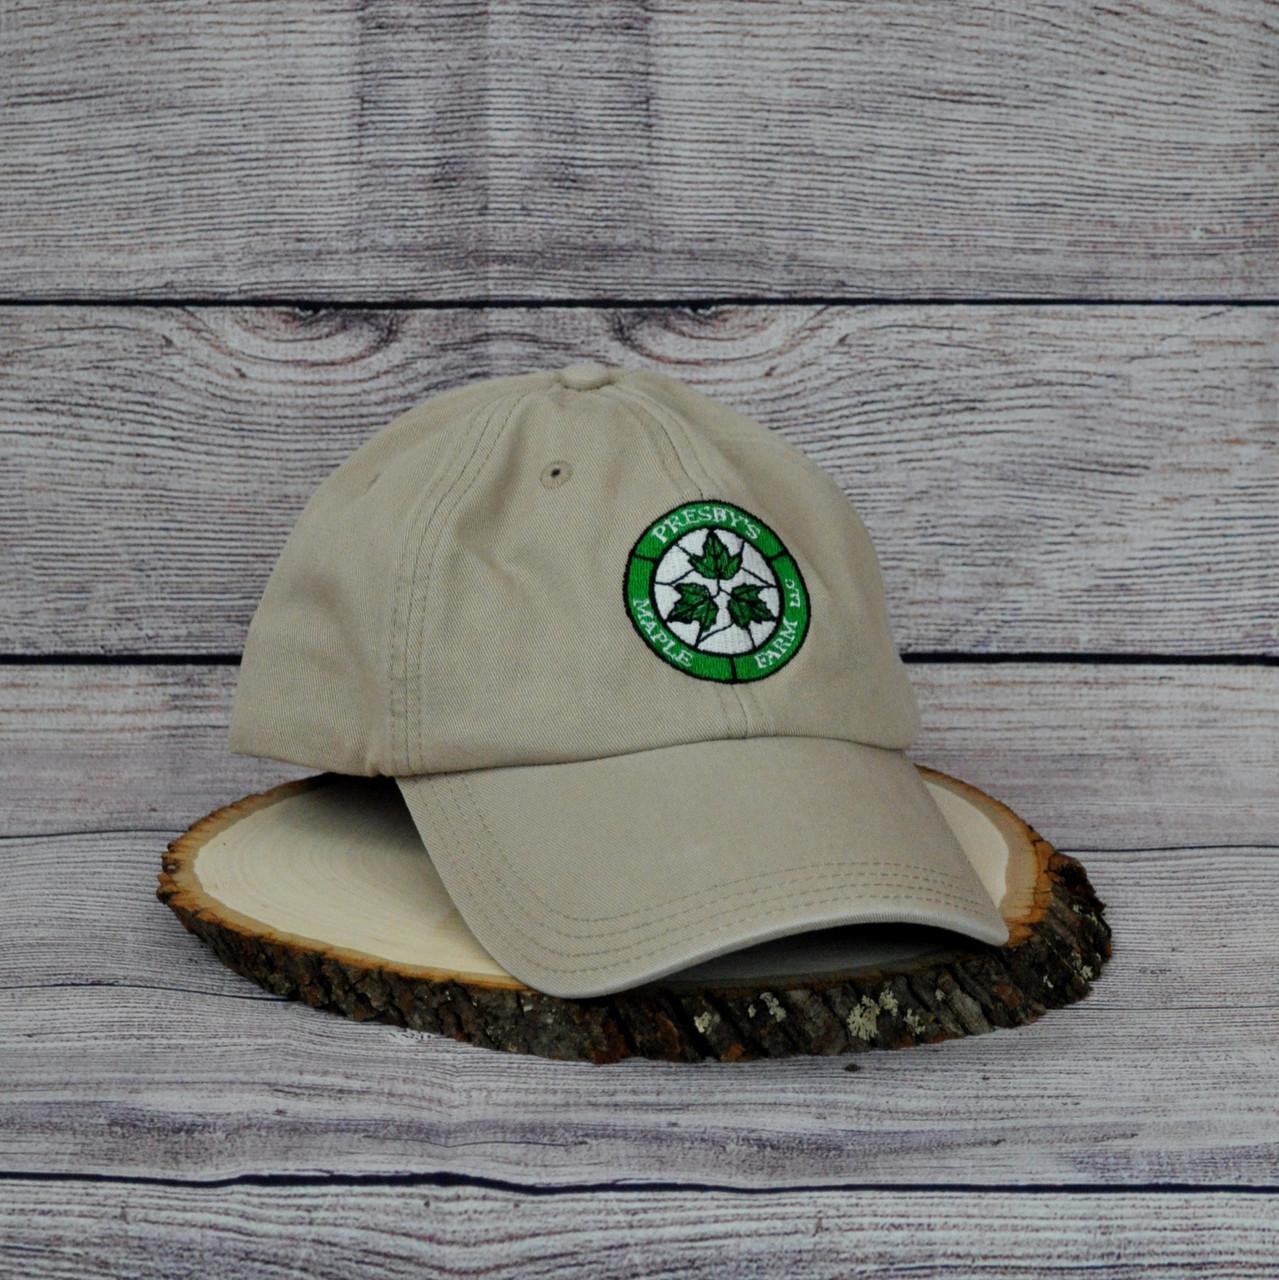 Presby's Maple Farm LLC ball cap find it on the Maplewood Golf club course.